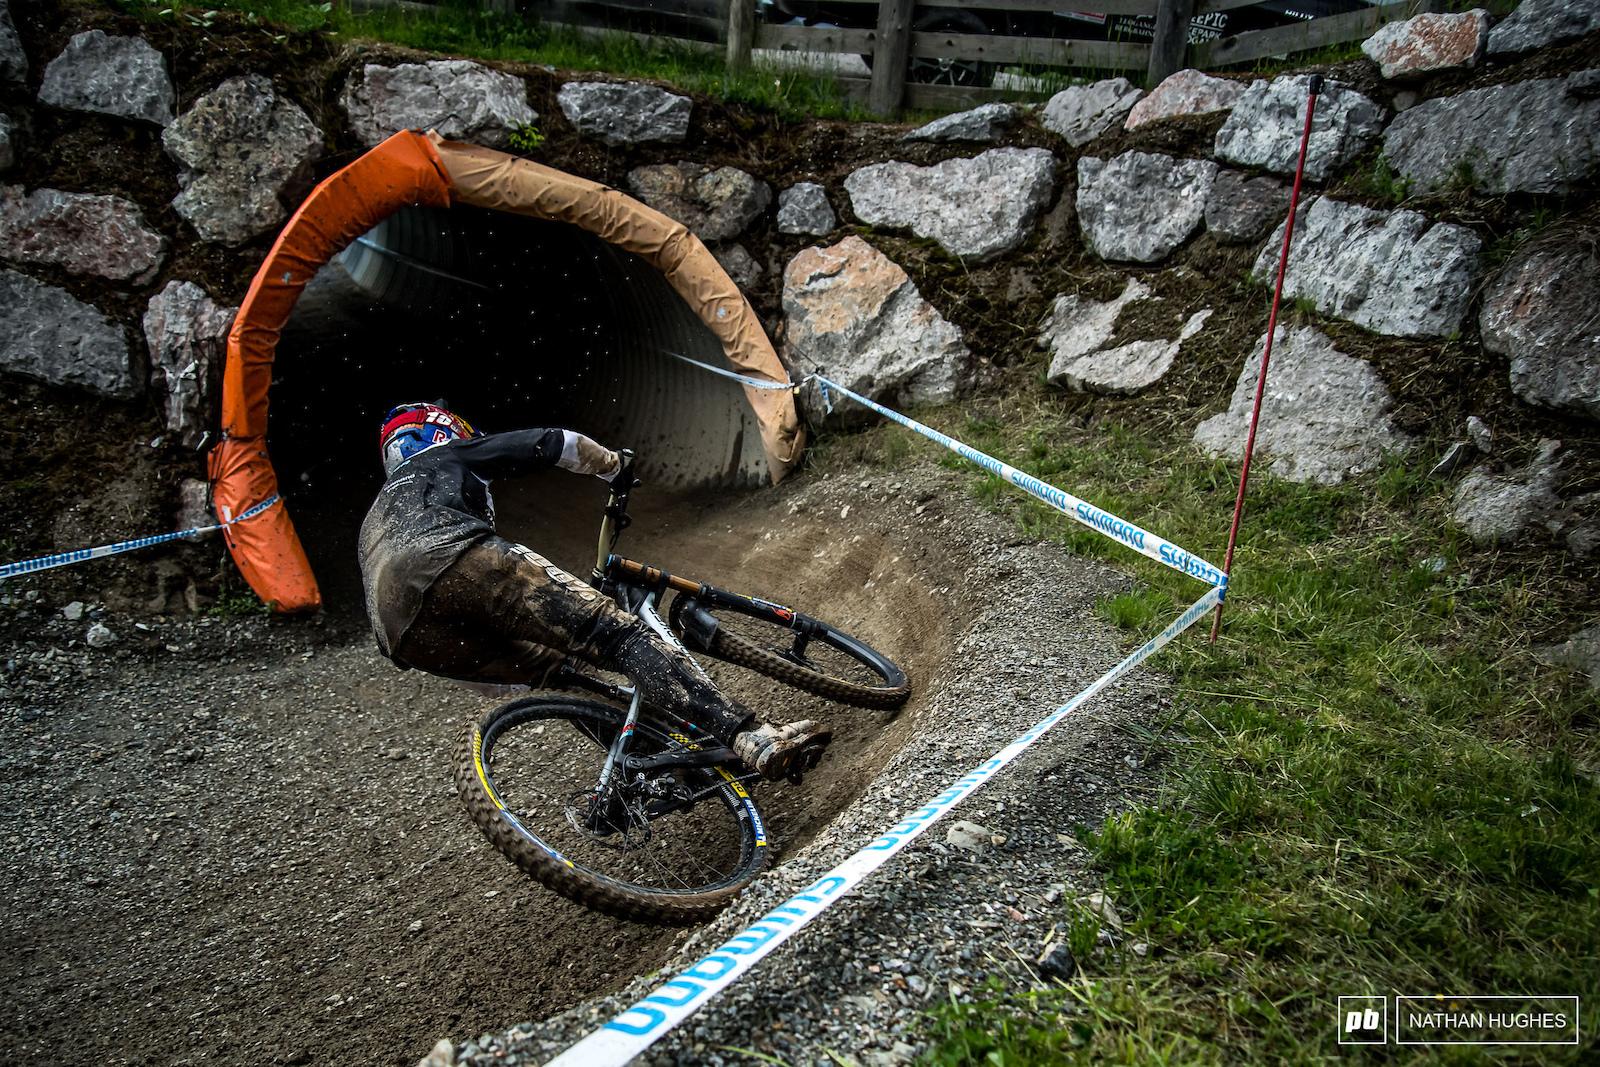 The Bulldog powering through mid-track tunnels.